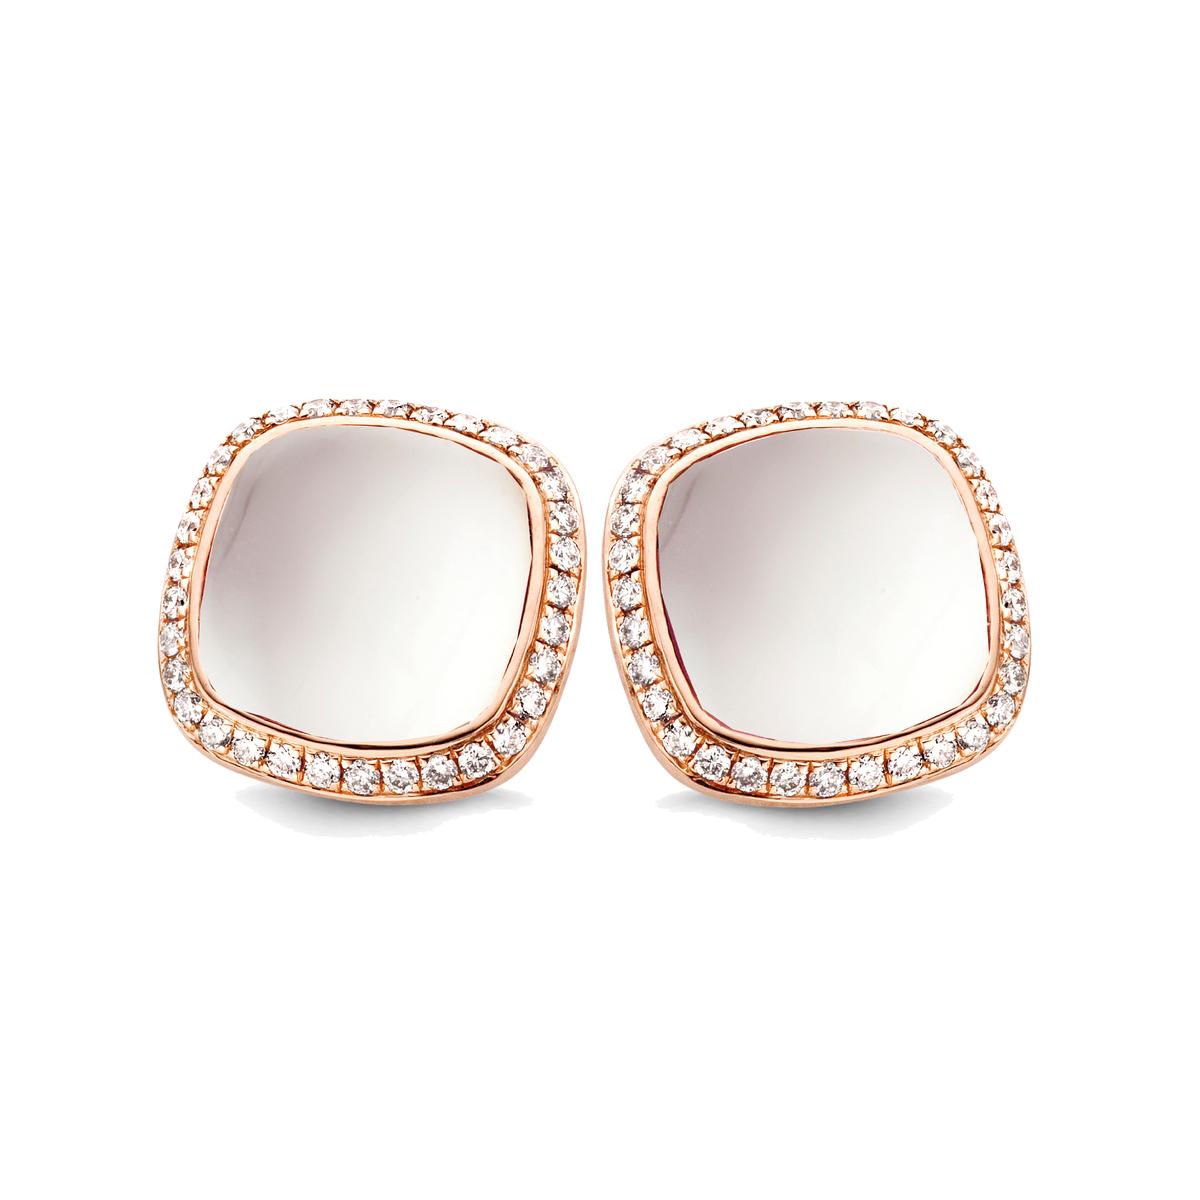 amiata earrings in rose gold